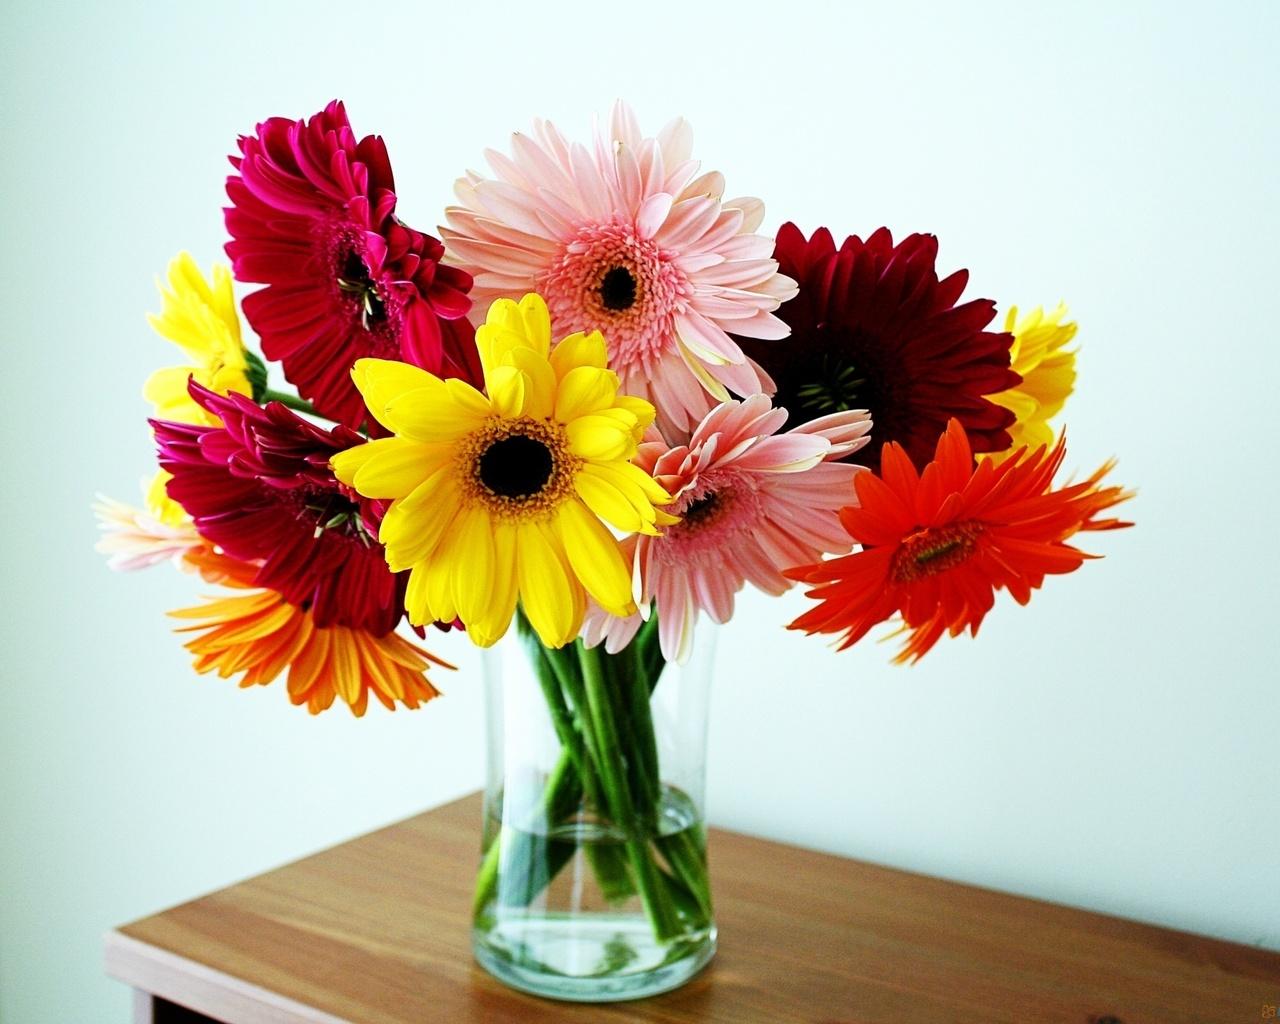 Открытки, картинки цветов в вазе